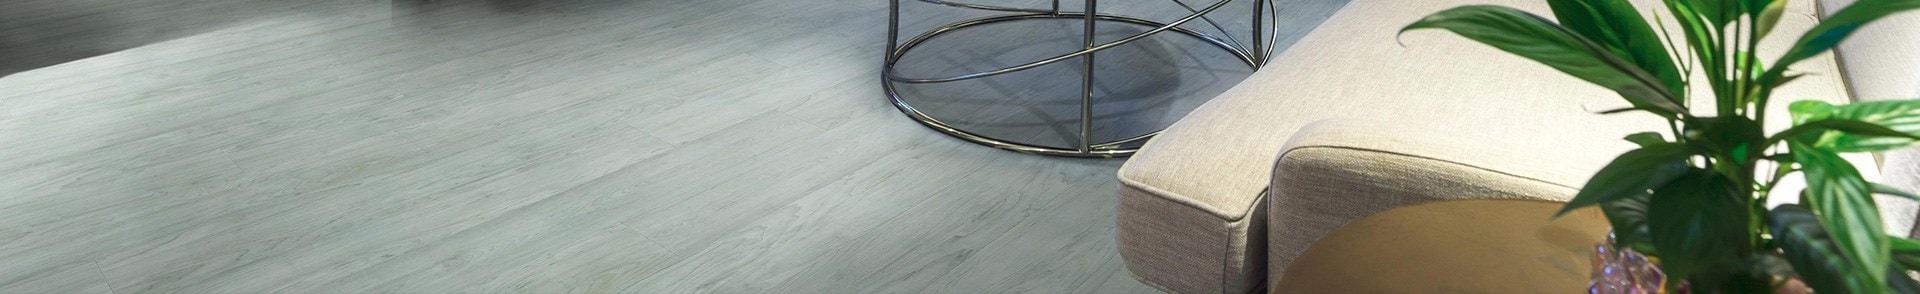 Adore Floors Products Decoria Buffalo Nickel Wo D051